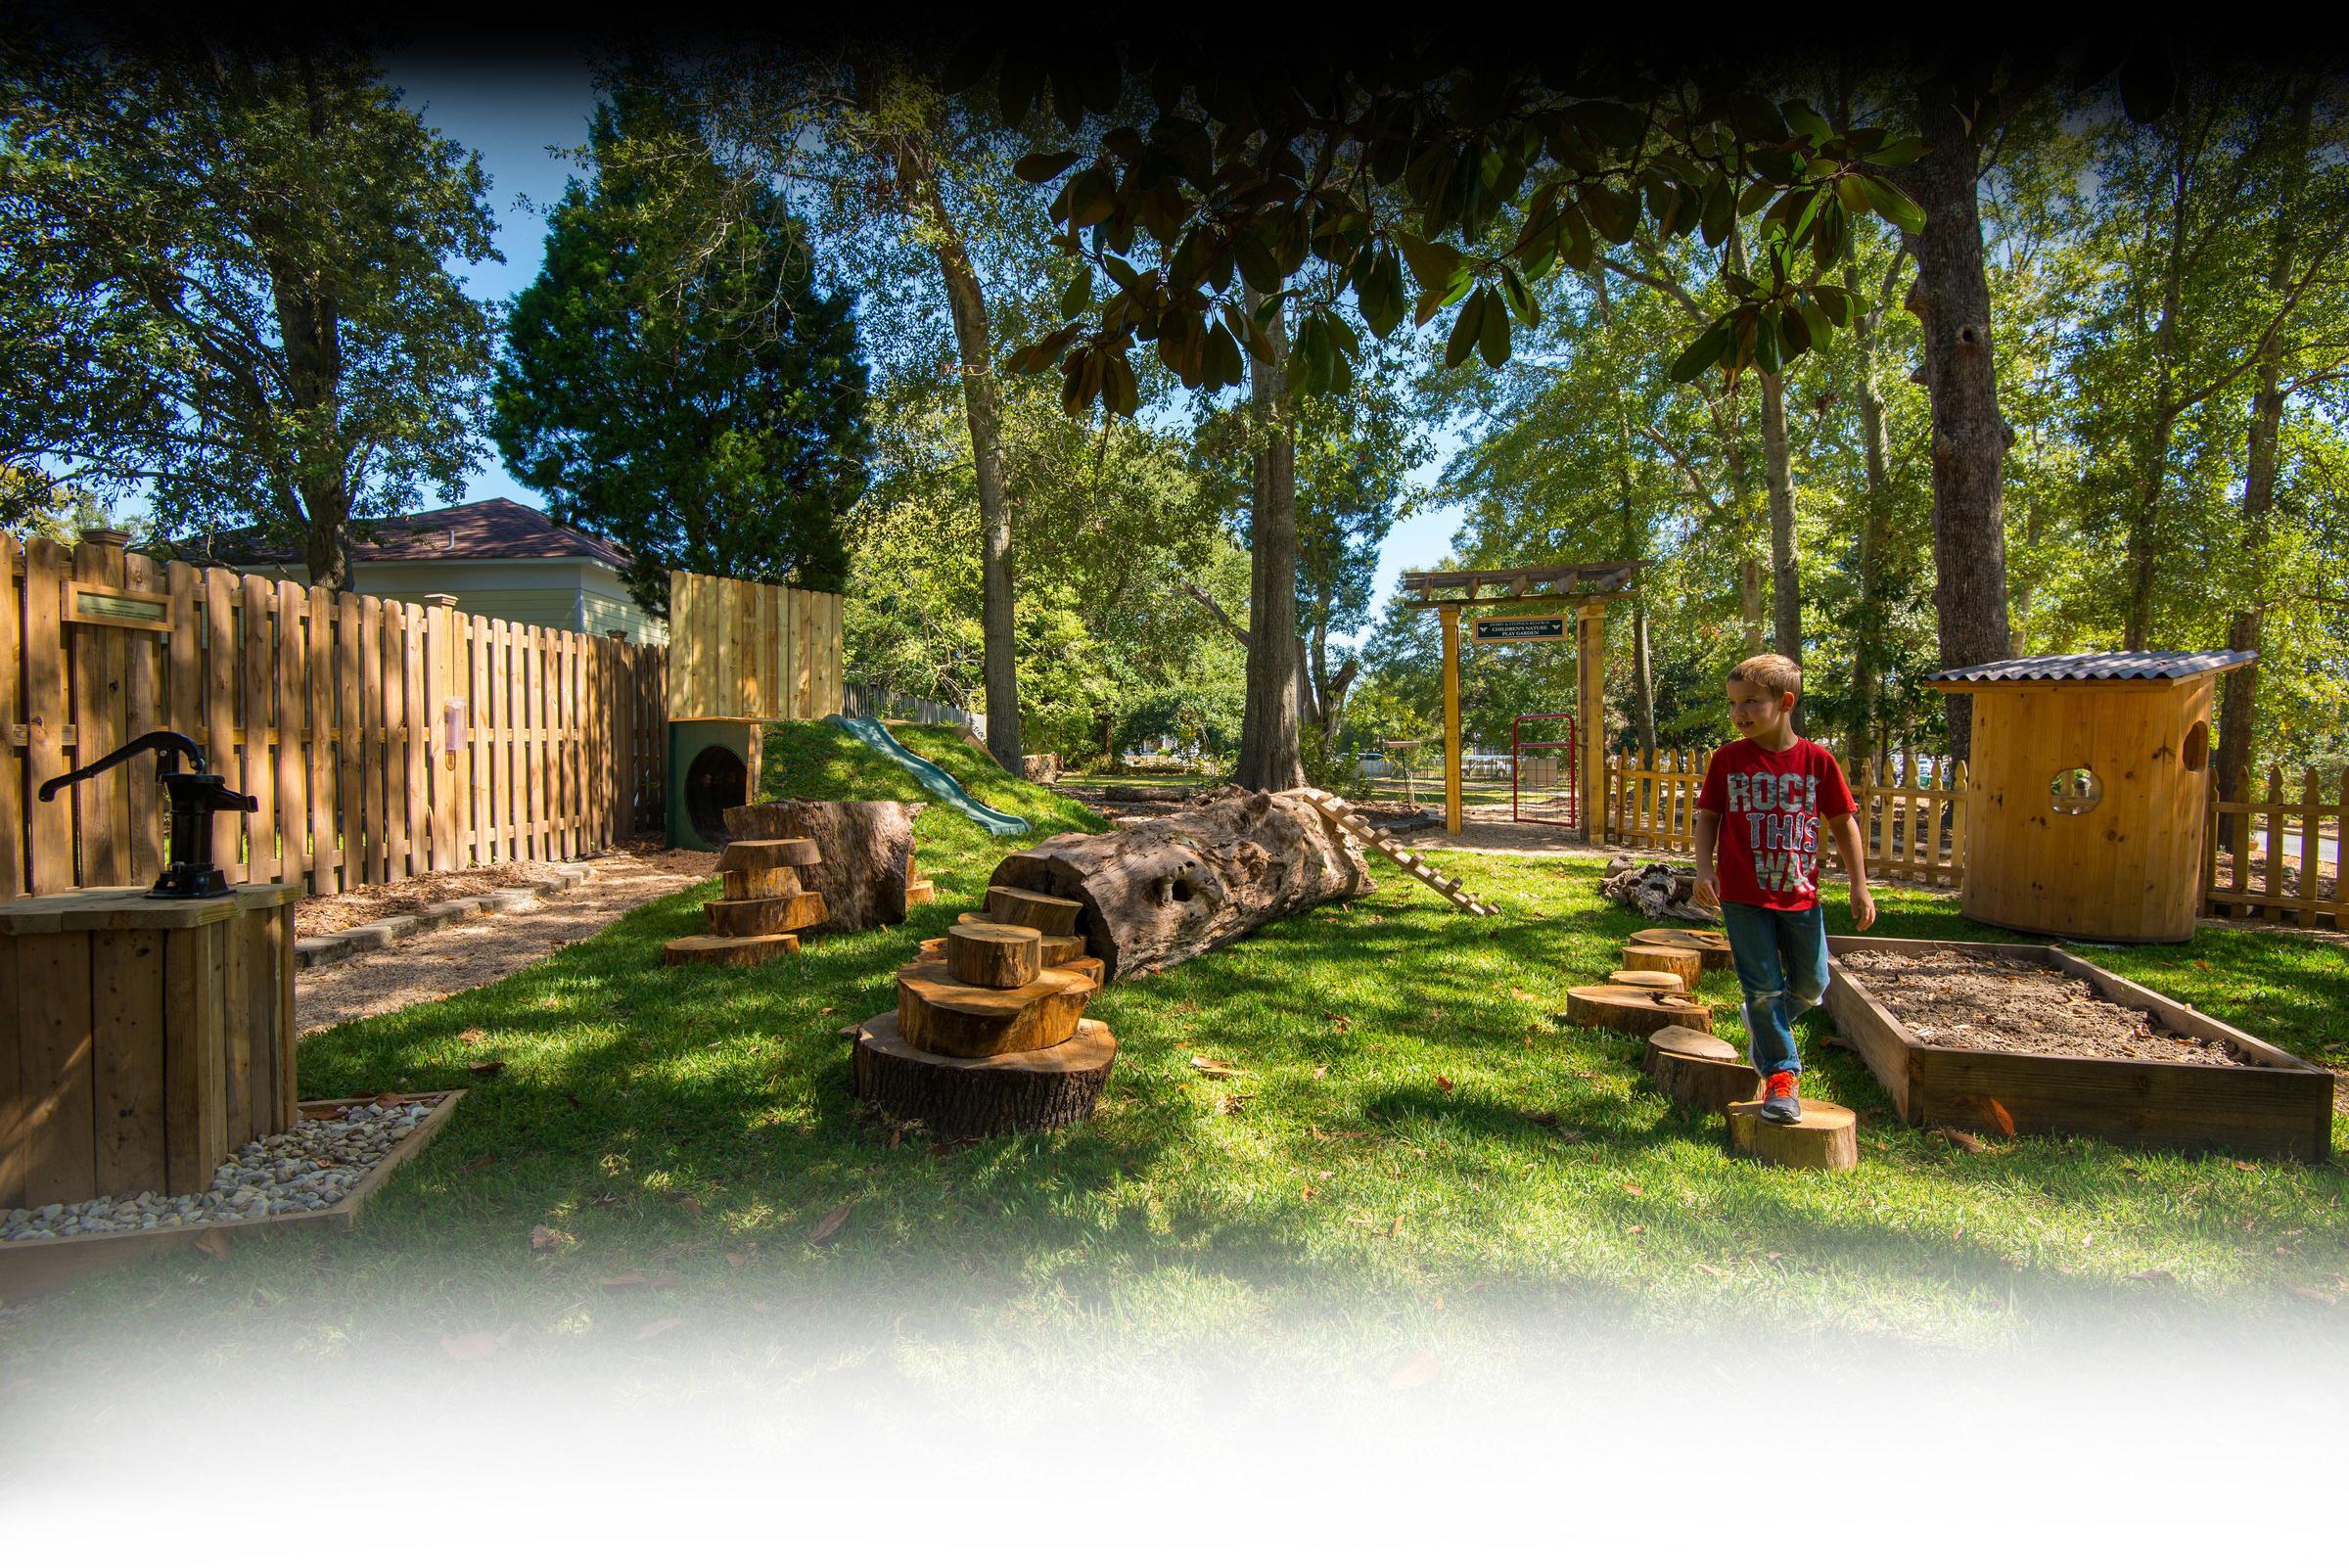 childrens nature discovery garden - Dicovery Garden